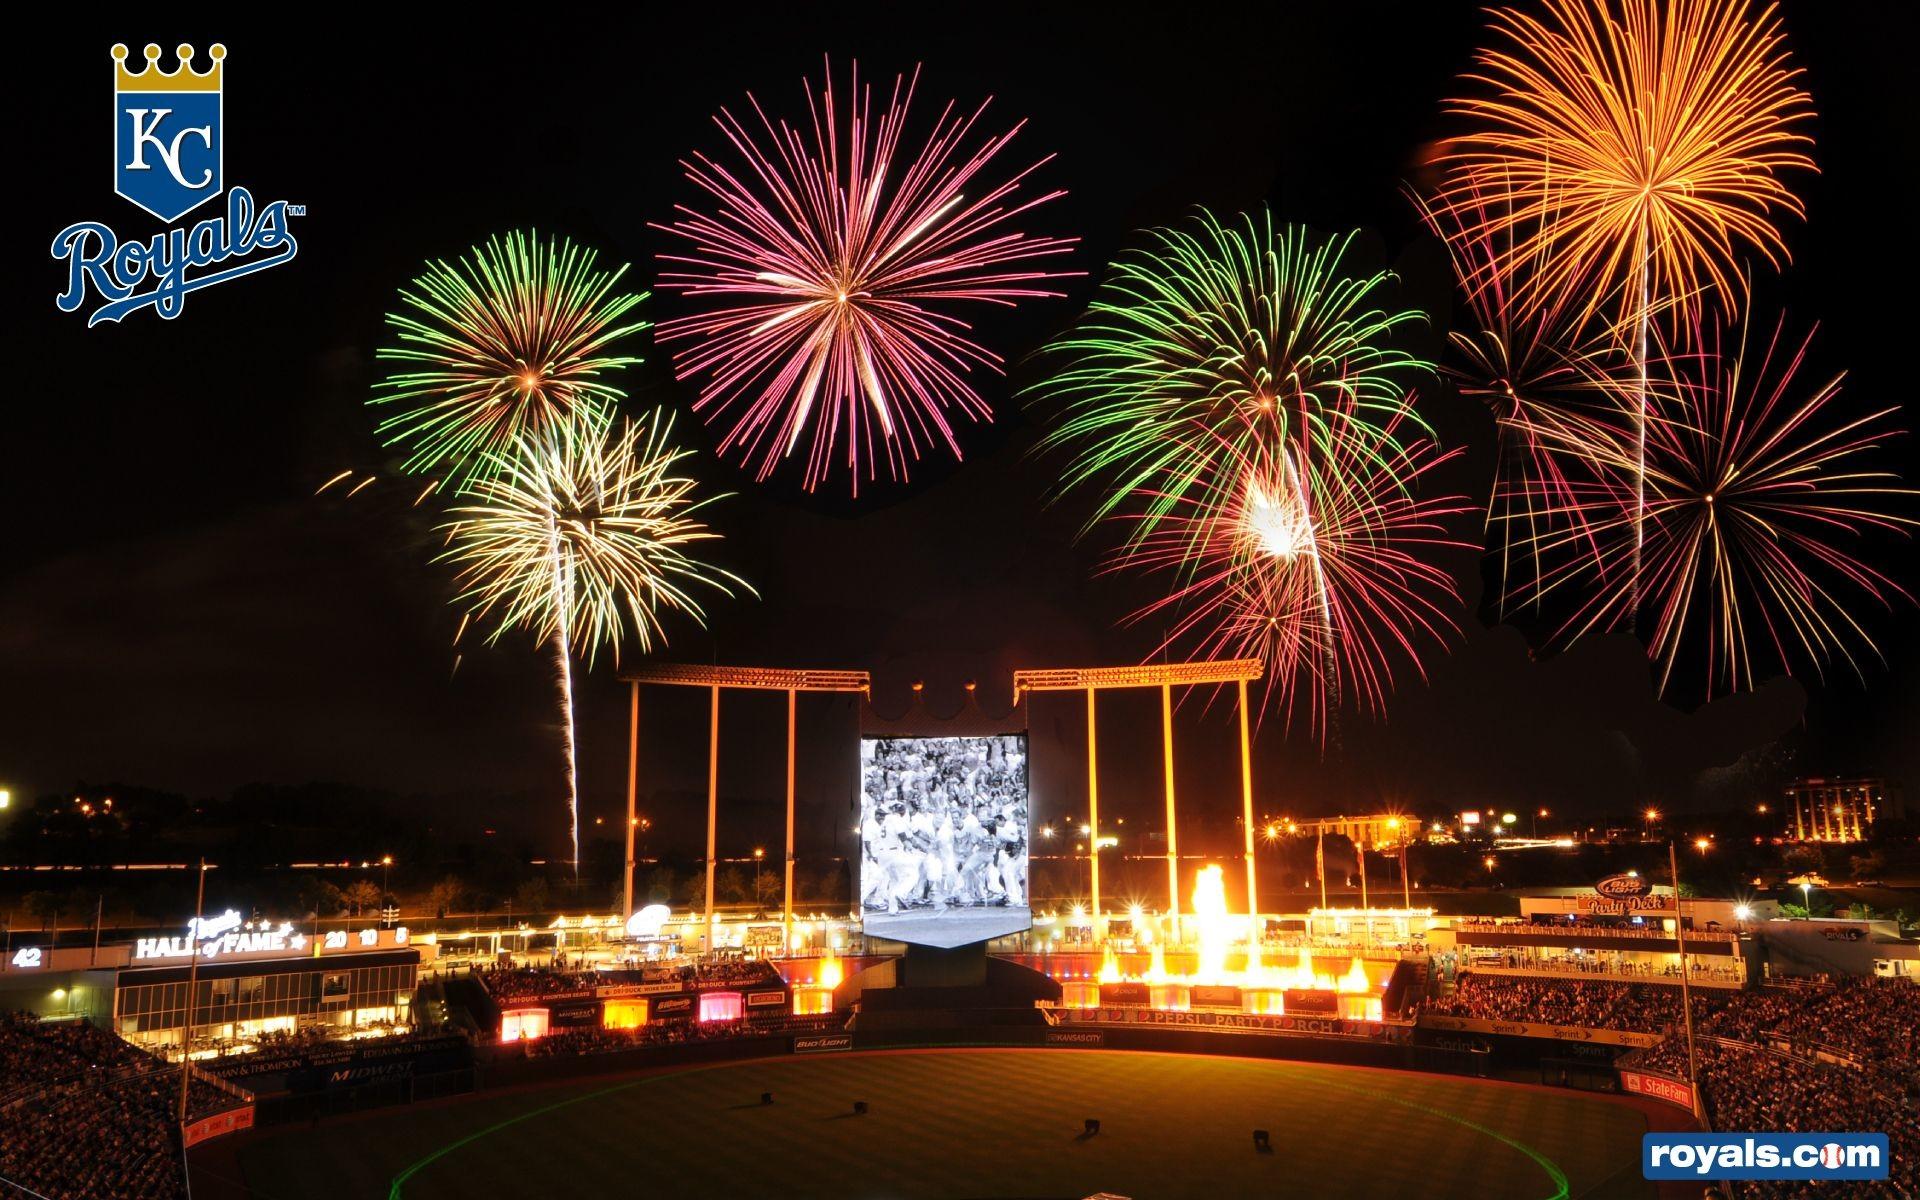 Kansas City Royals Stadium Wallpaper